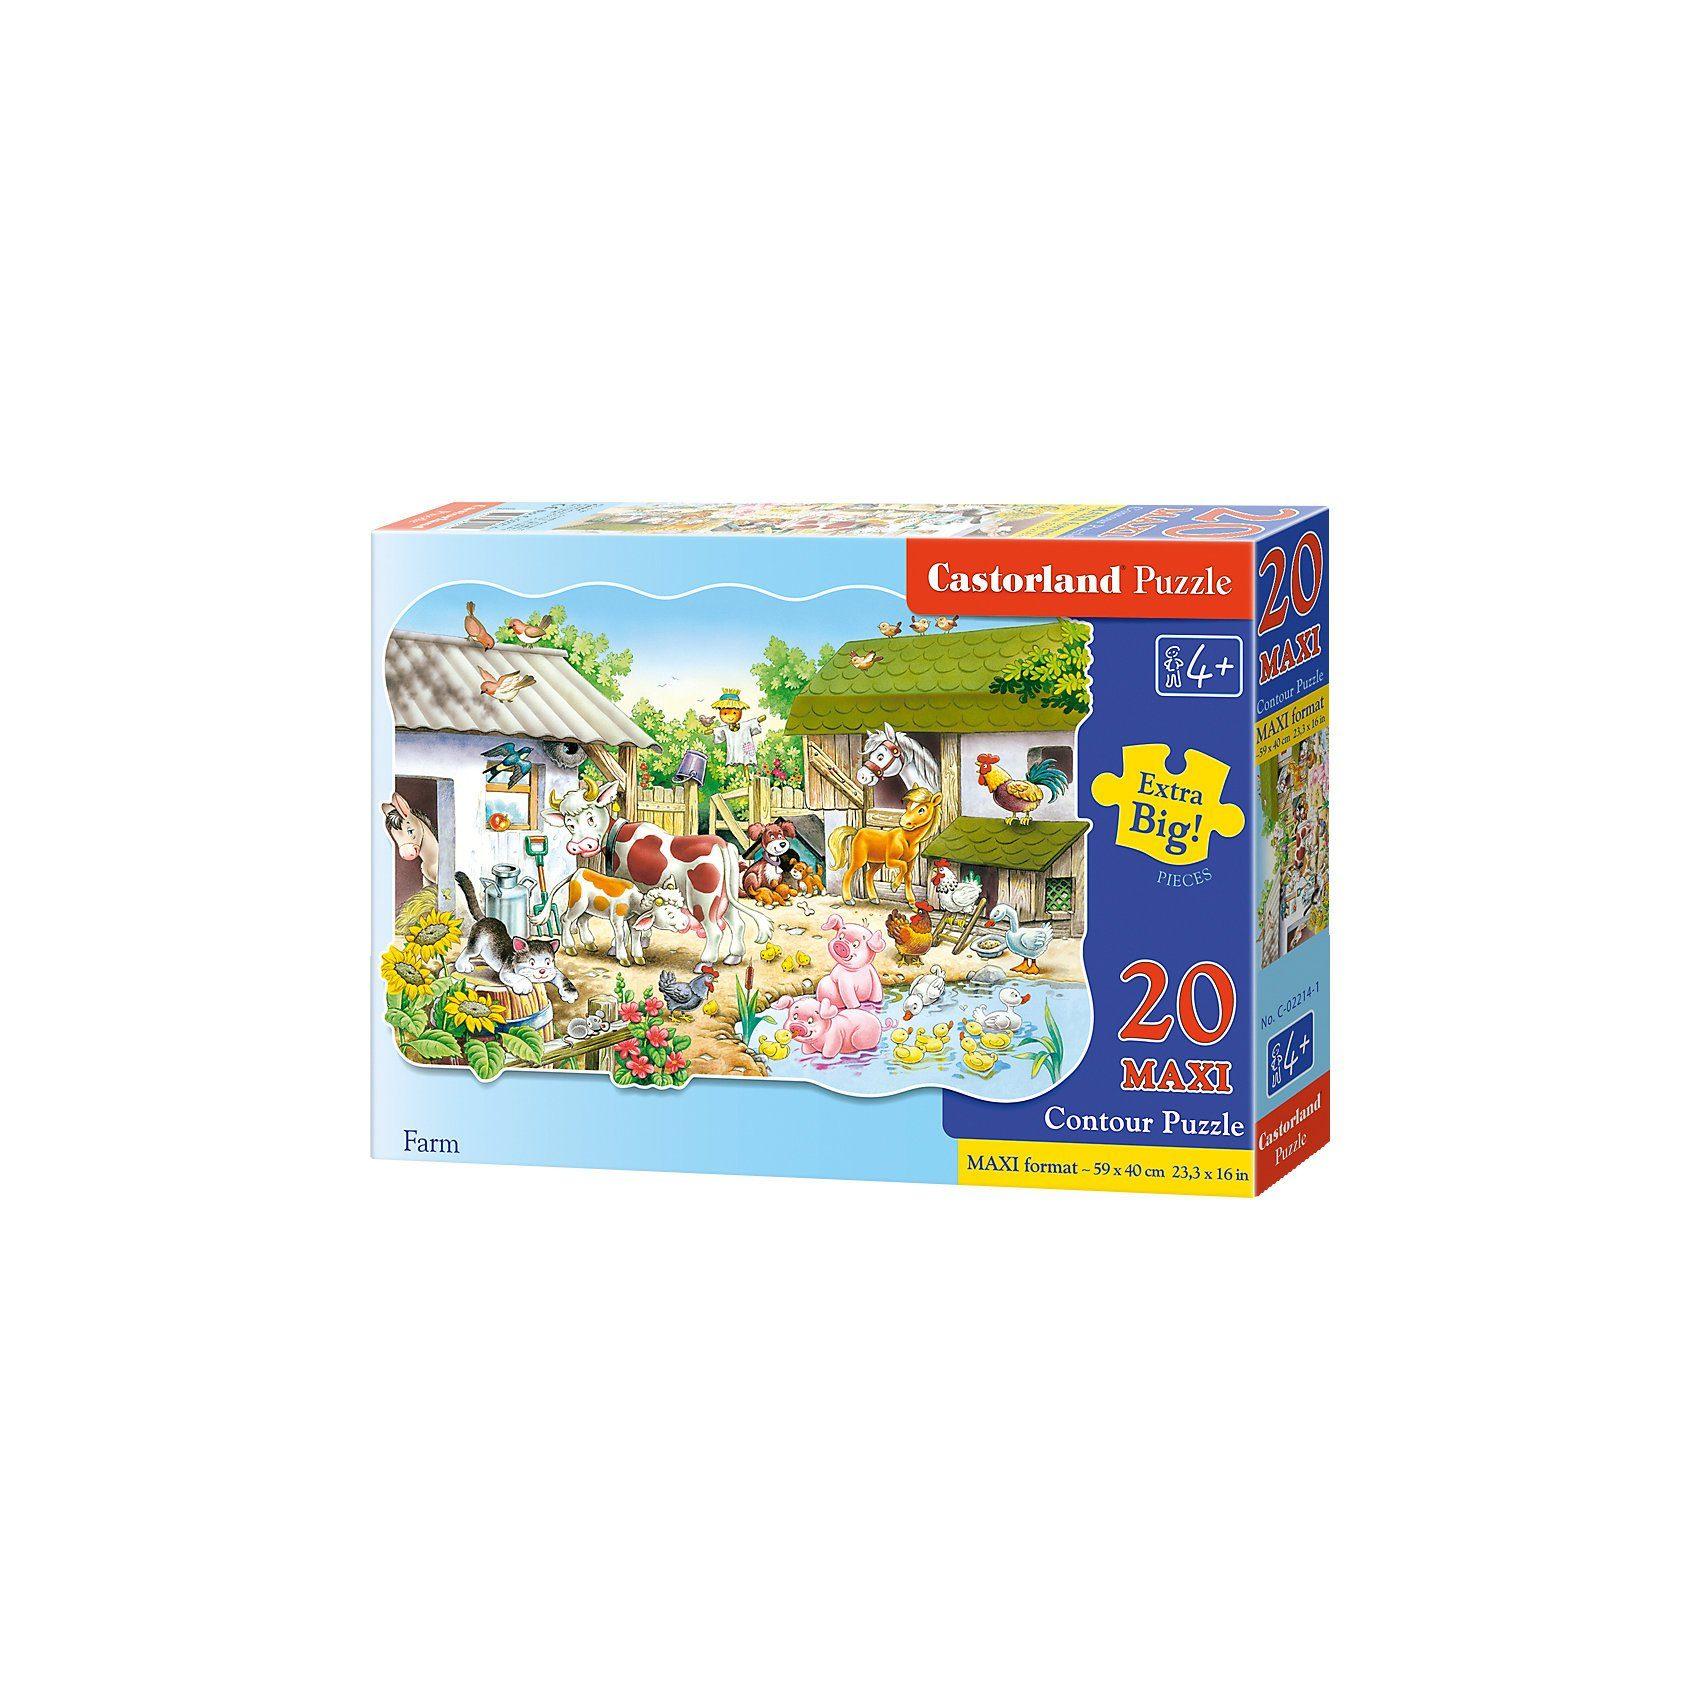 Castorland Bodenpuzzle 20 Teile Maxi - Bauernhof